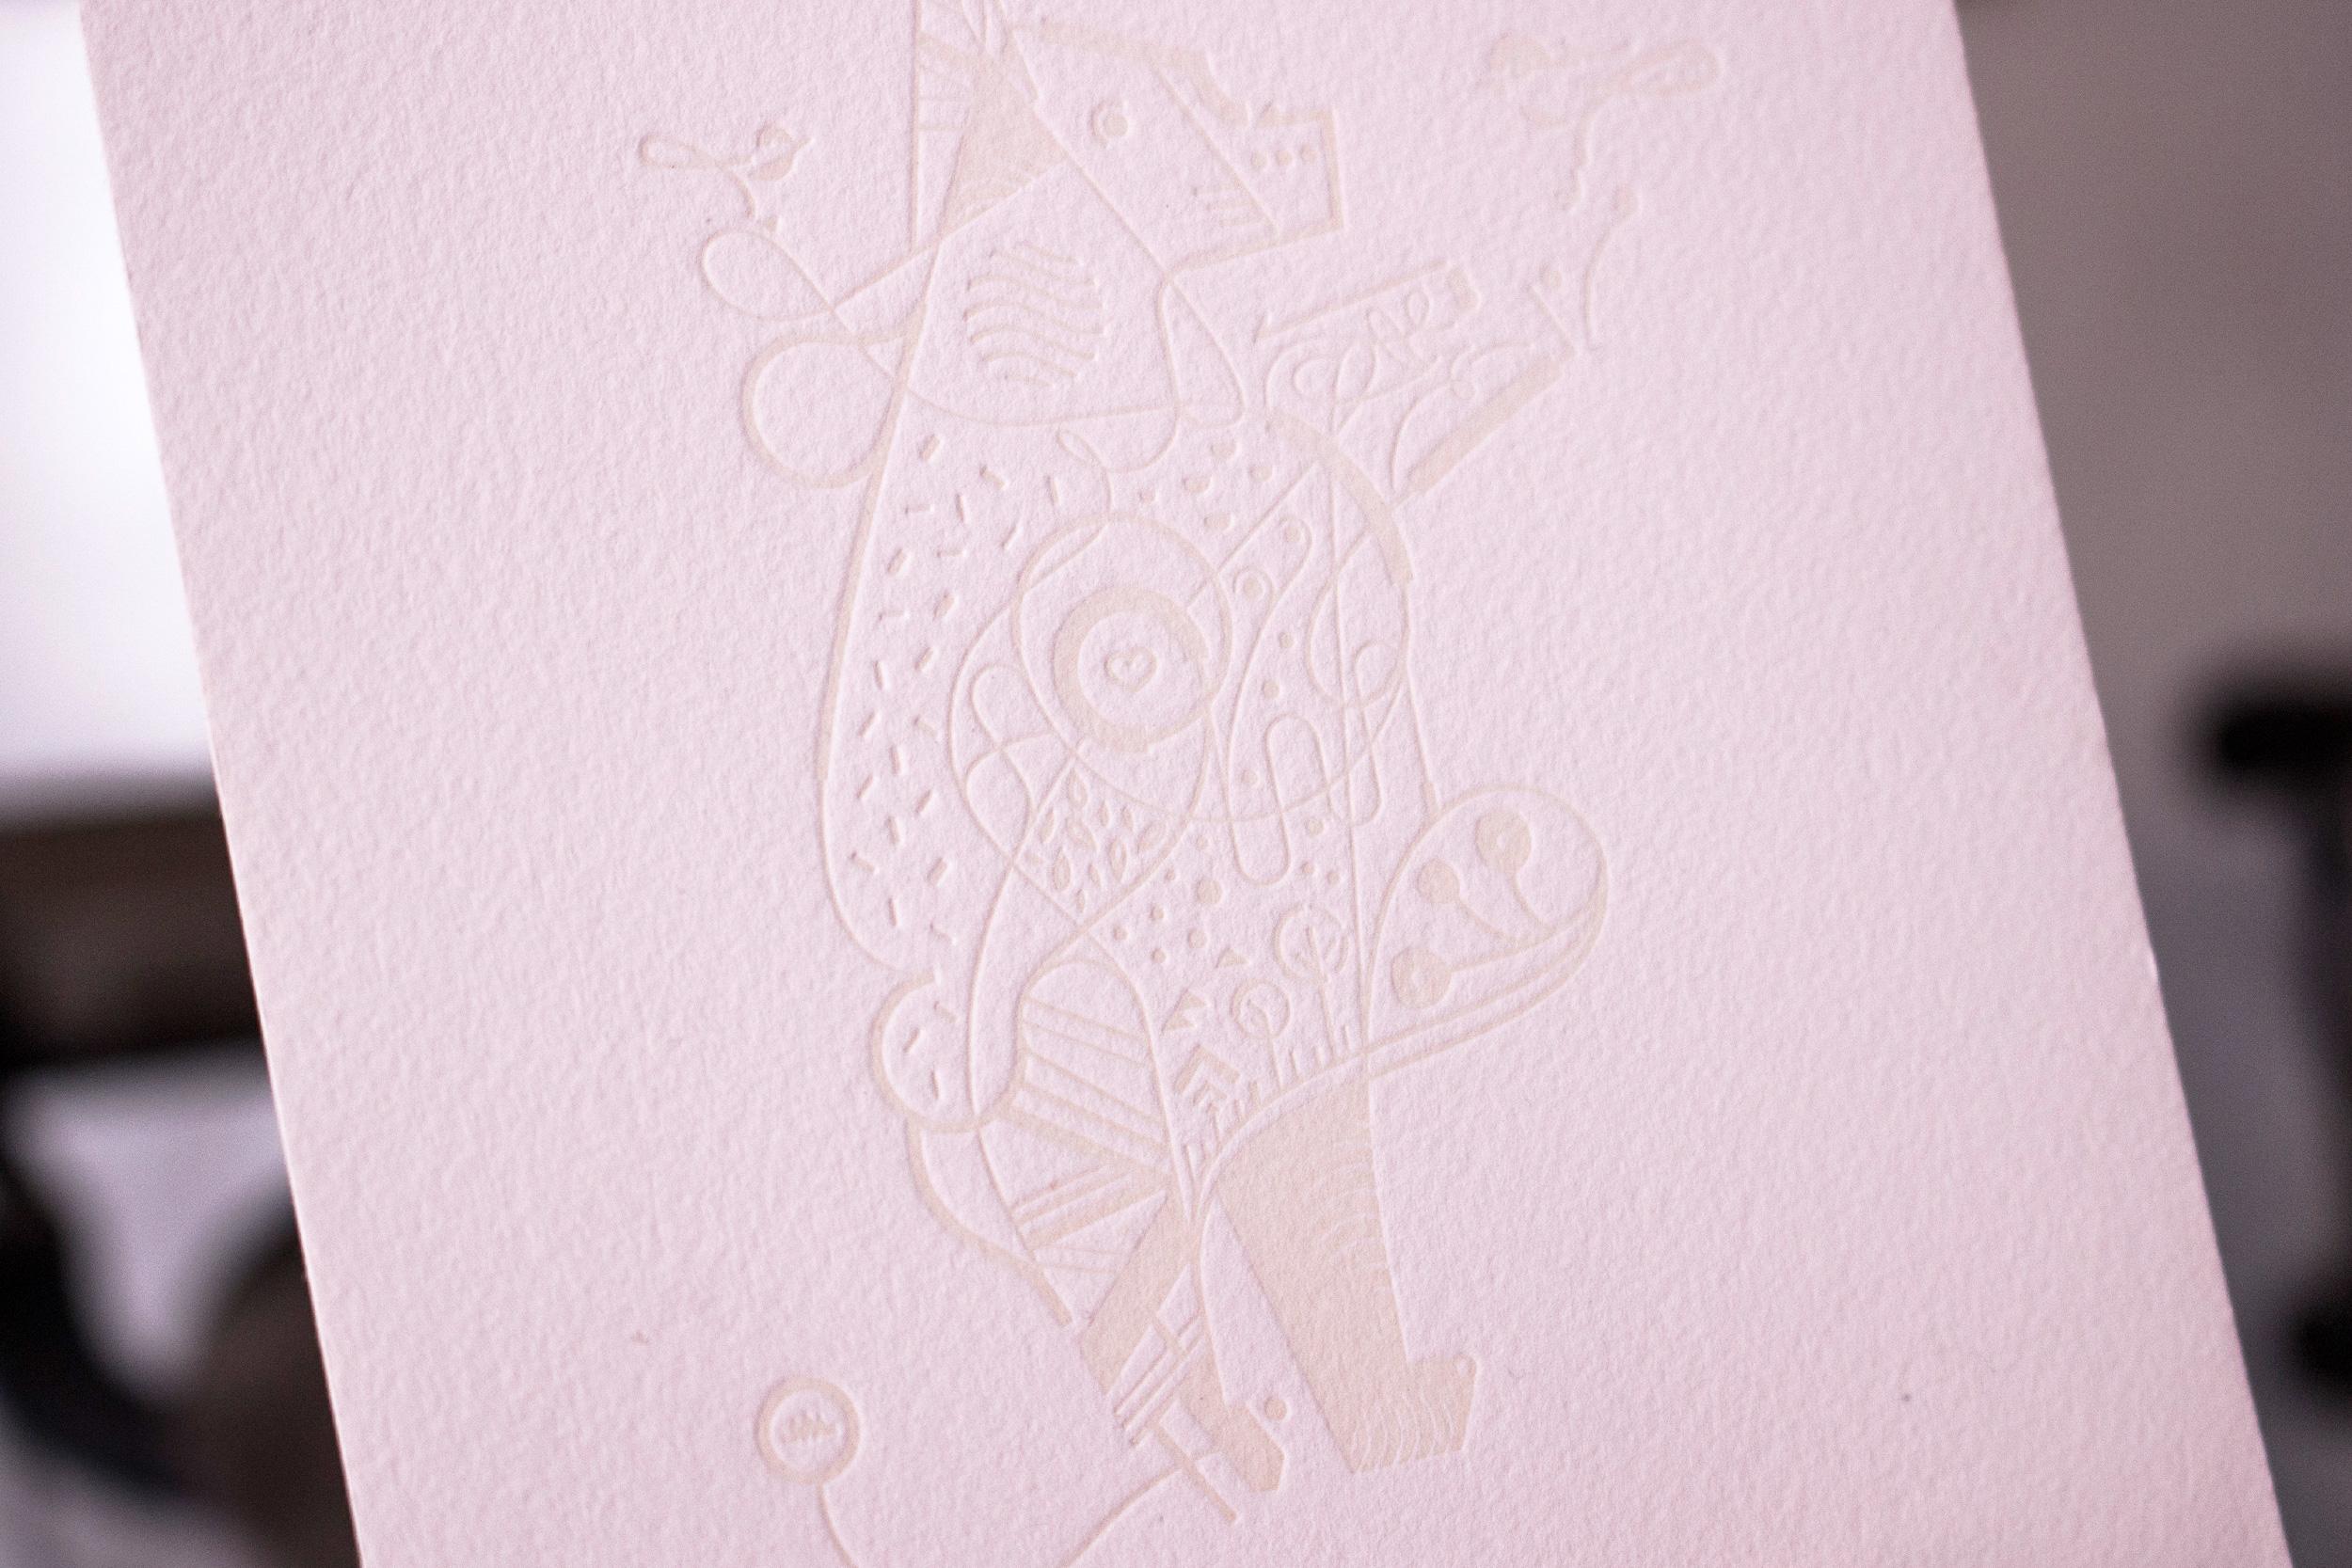 ediciones-leandro-castelao-papel-principal-letterpress-imprenta-tipografica-1.jpg